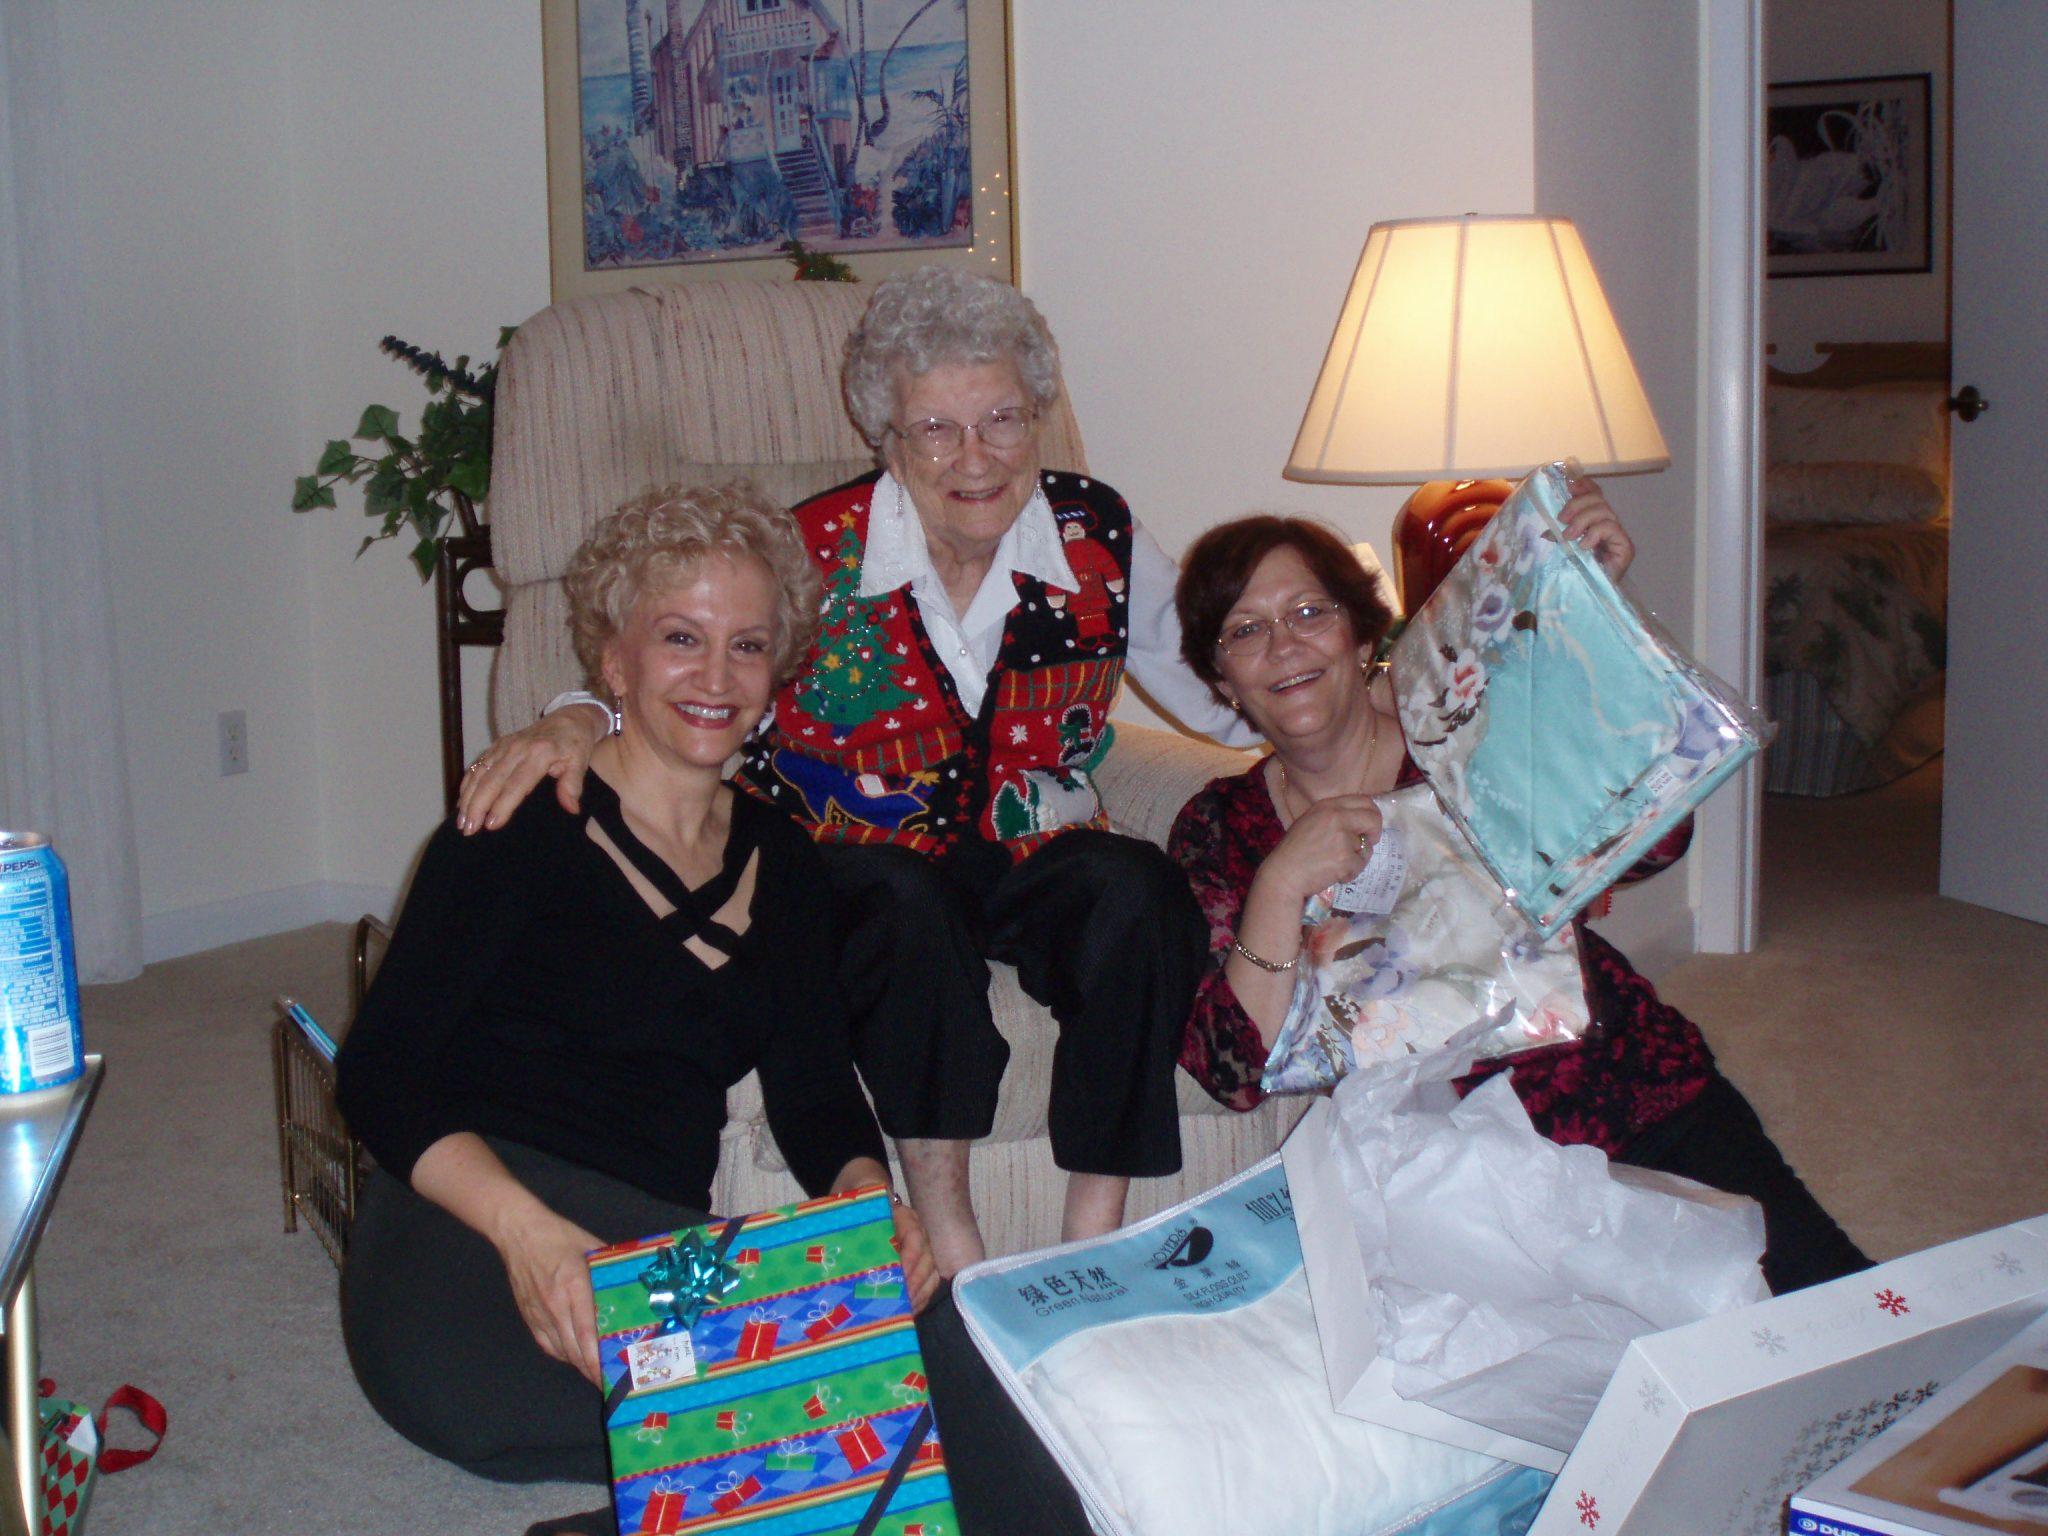 Laura, Mom and Sue 2006 Christmas